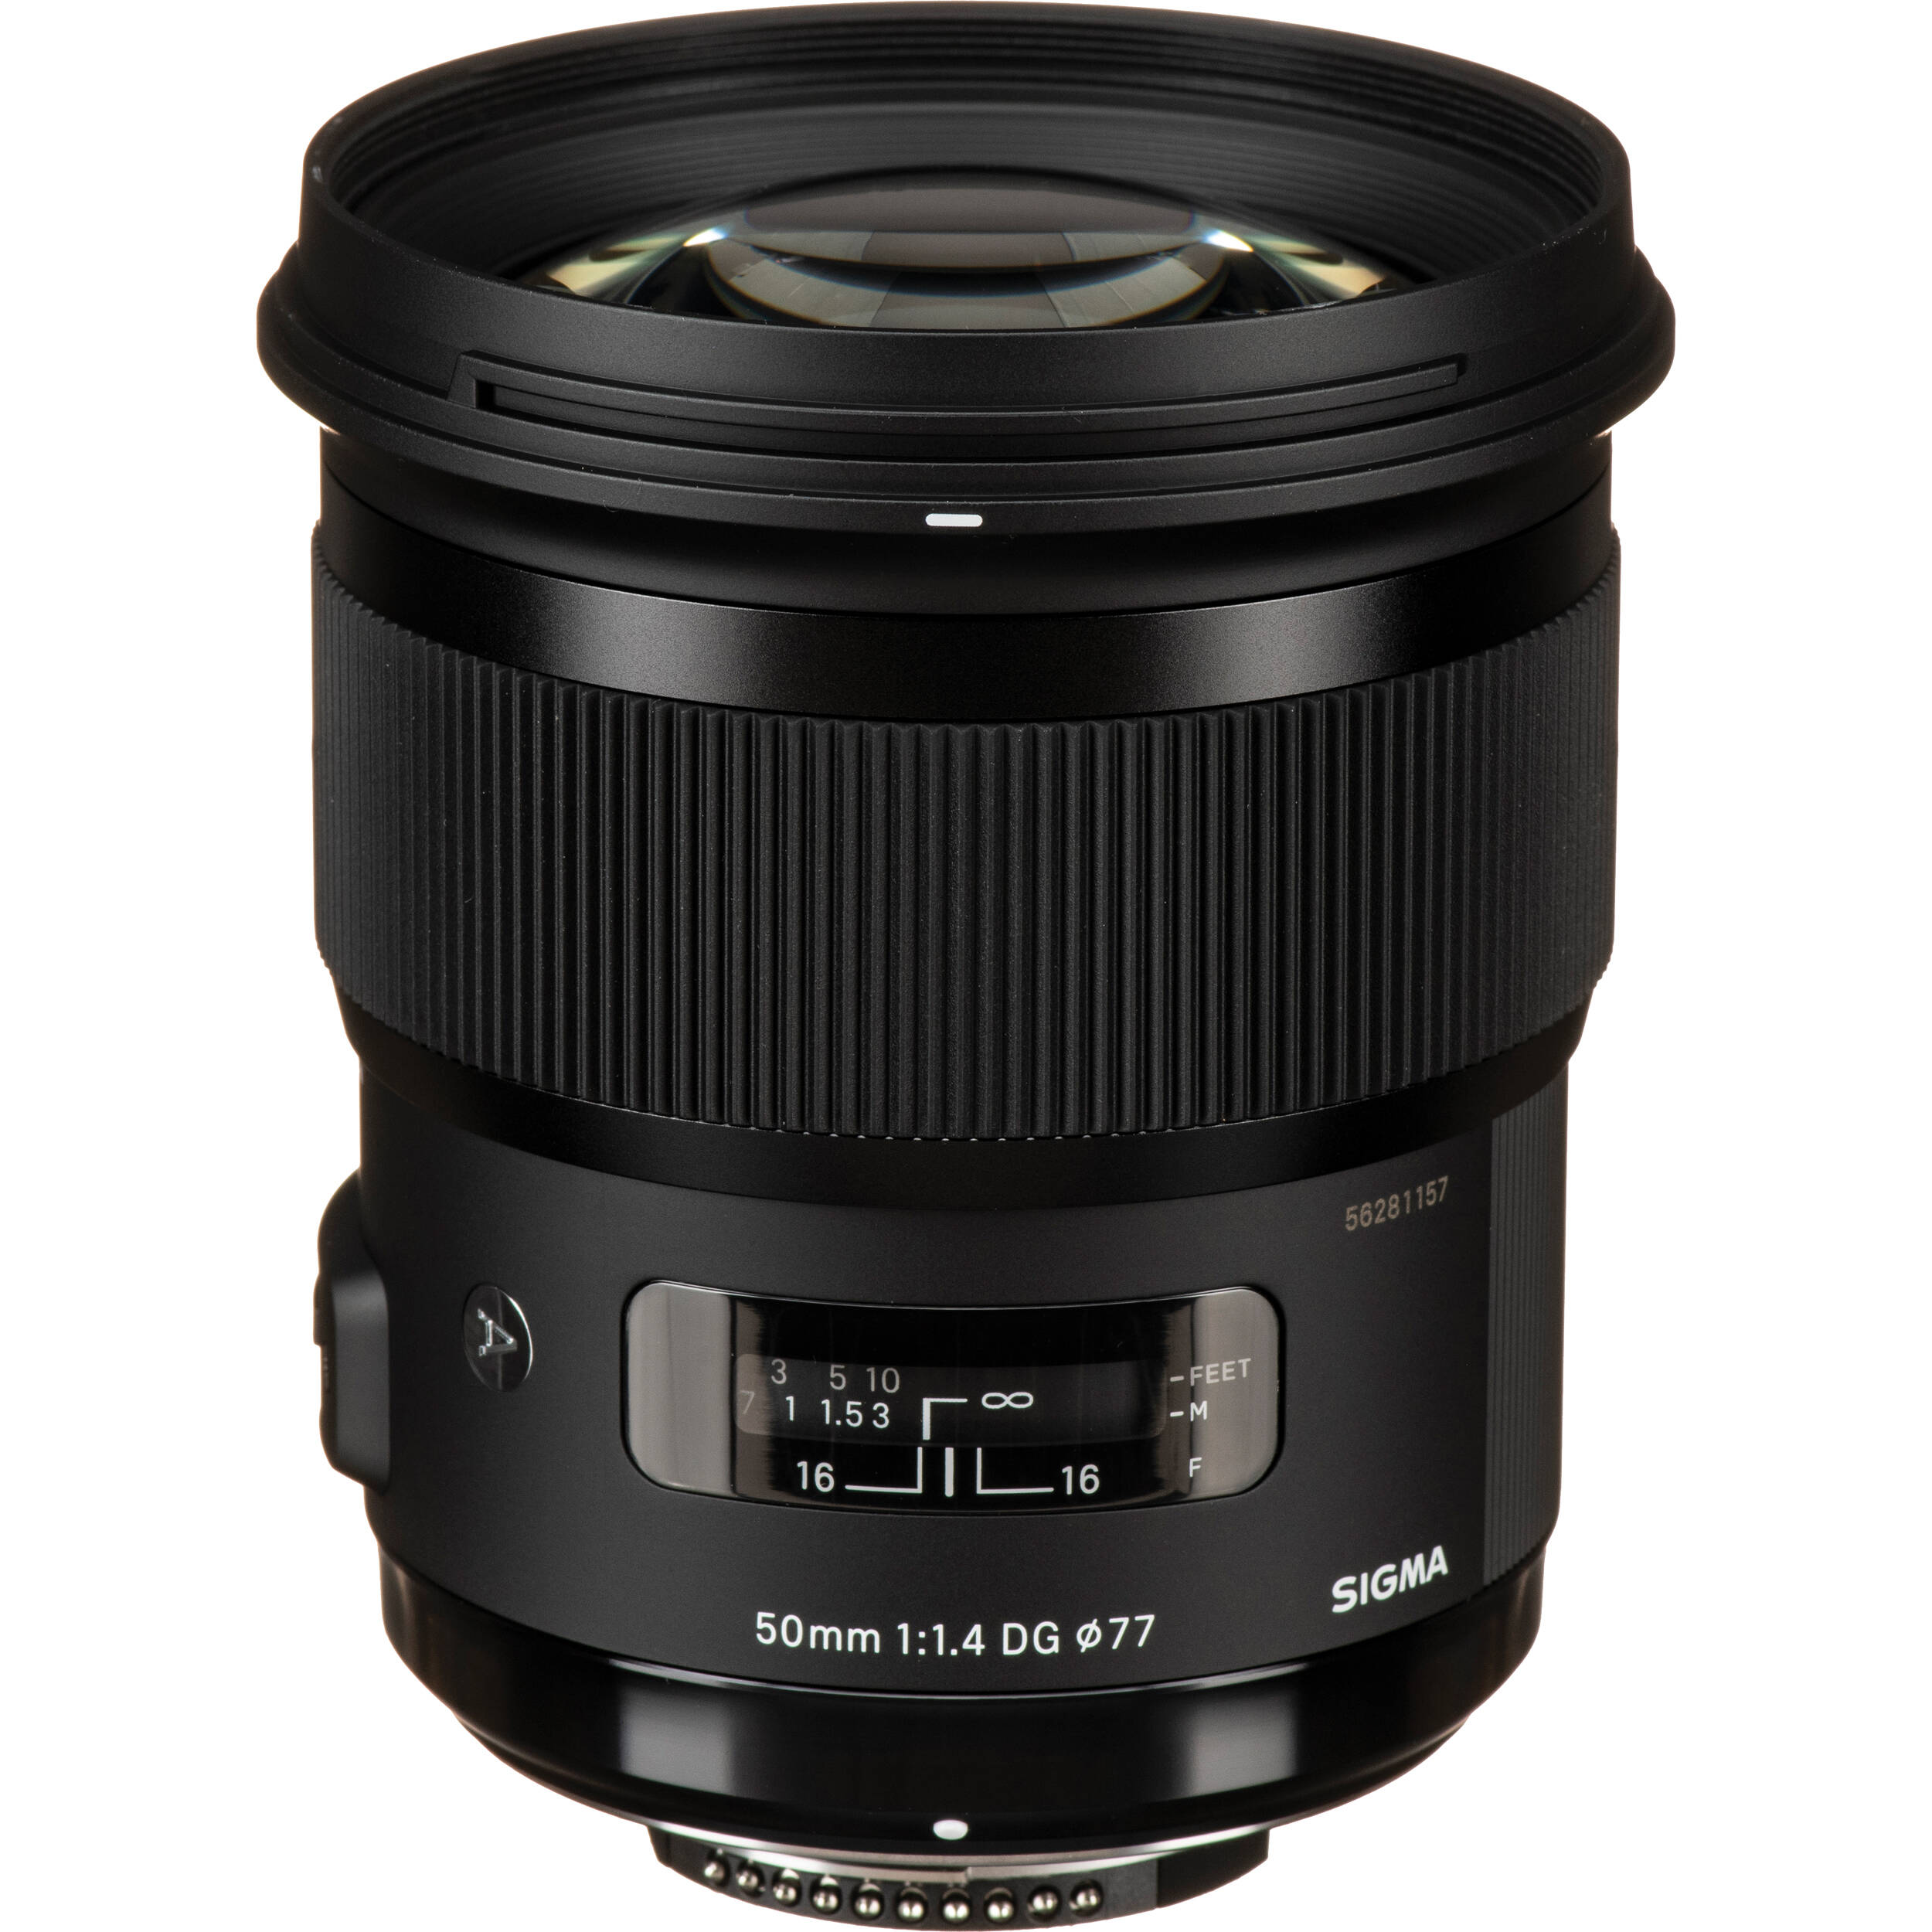 Sigma 50mm F 1 4 Dg Hsm Art Lens For Canon Ef 311101 B H Photo